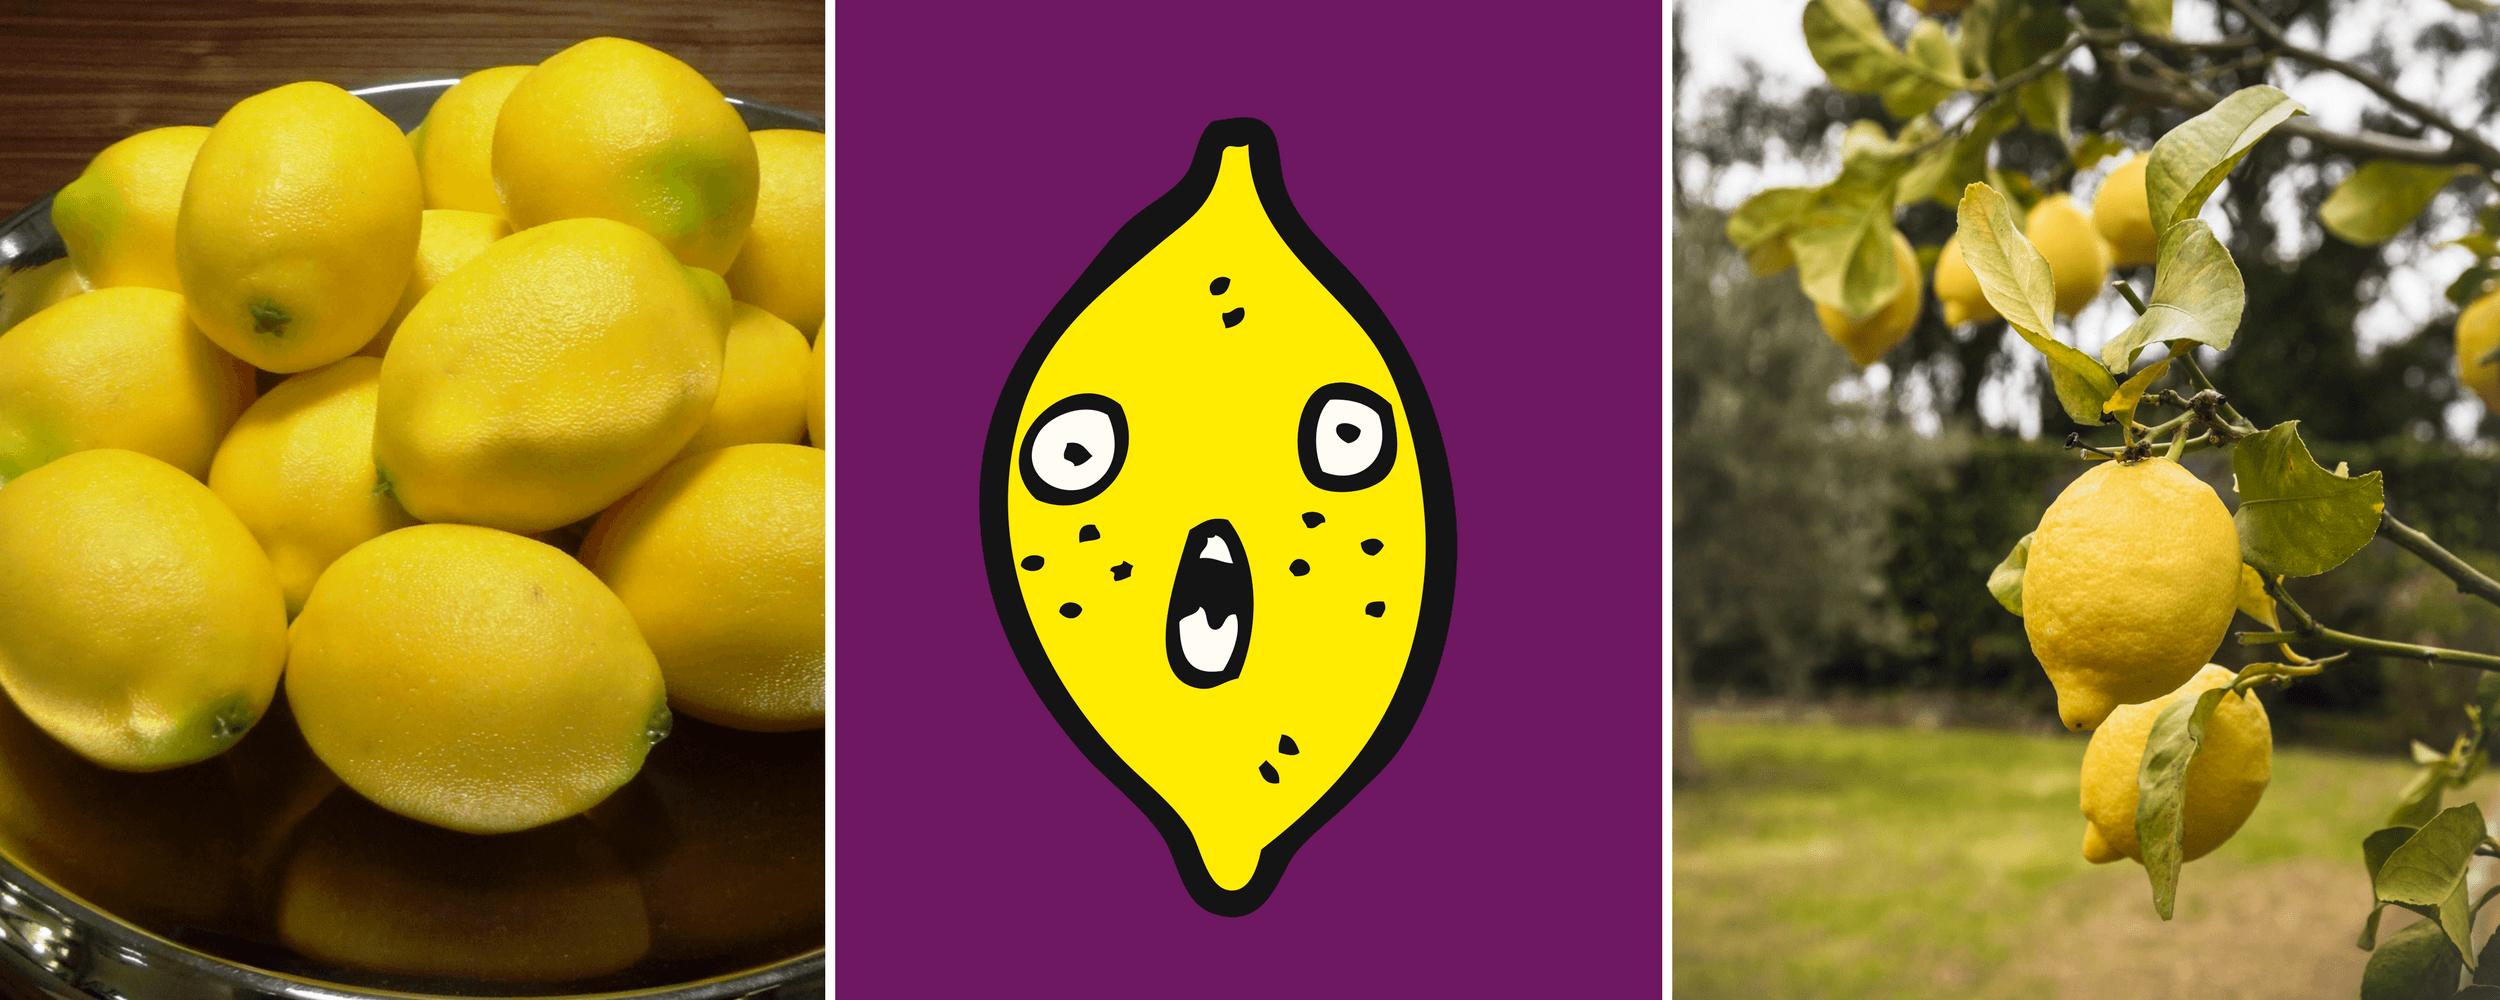 Marketing lemon on a form